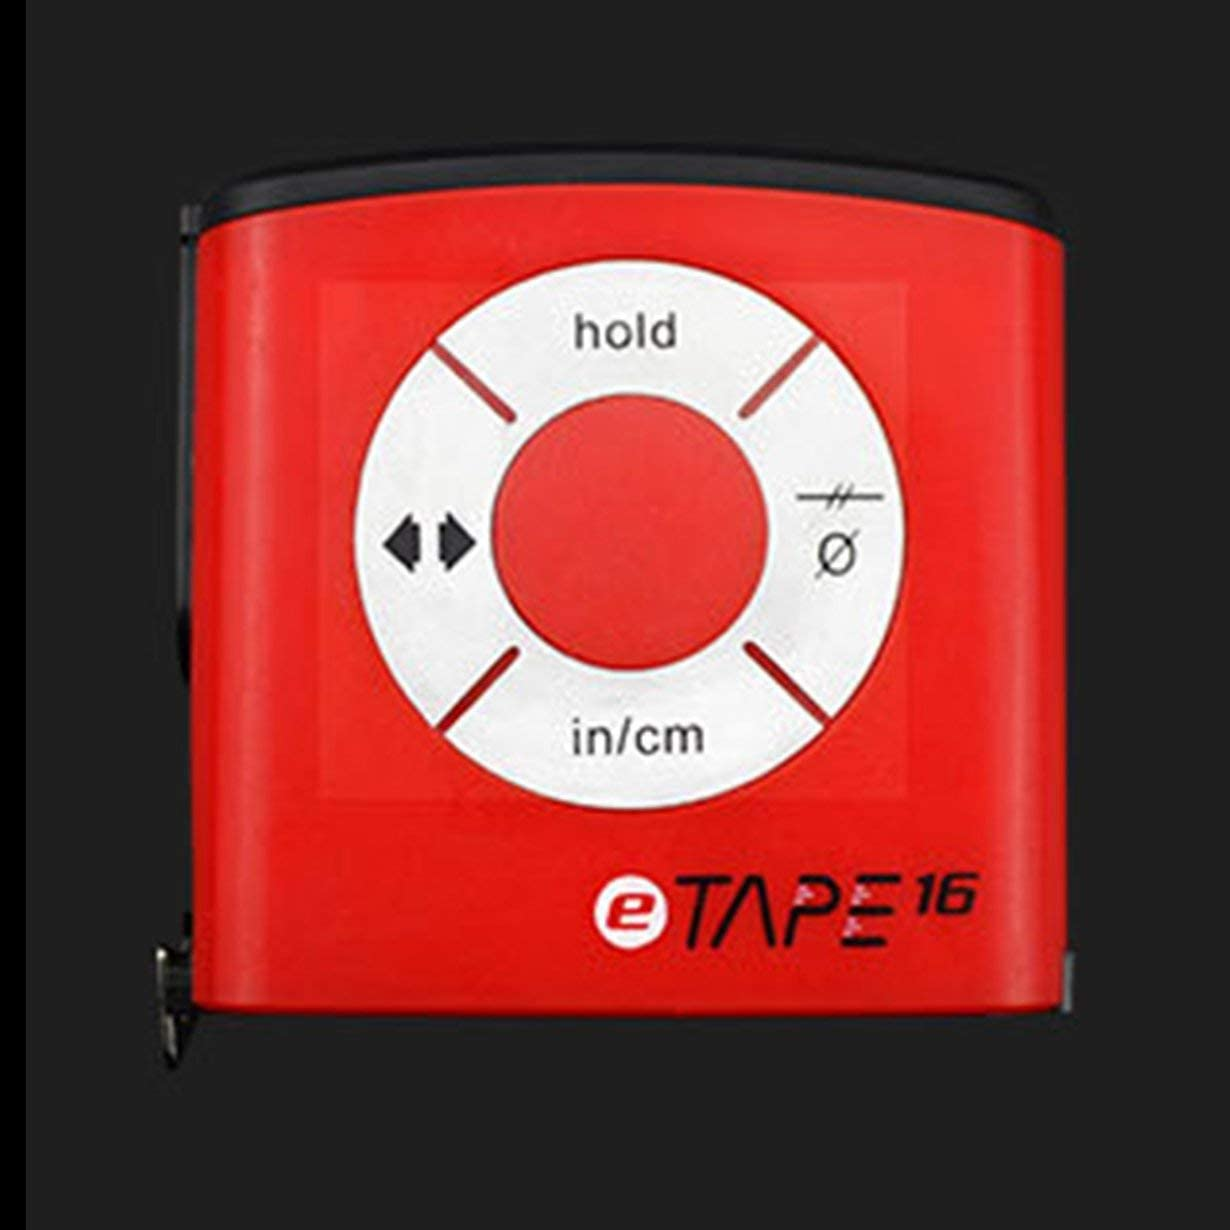 Digital Tape Measure 5M 16Ft Lcd Portable Measure Accurately Electronic Steel Metric Measurement Tools